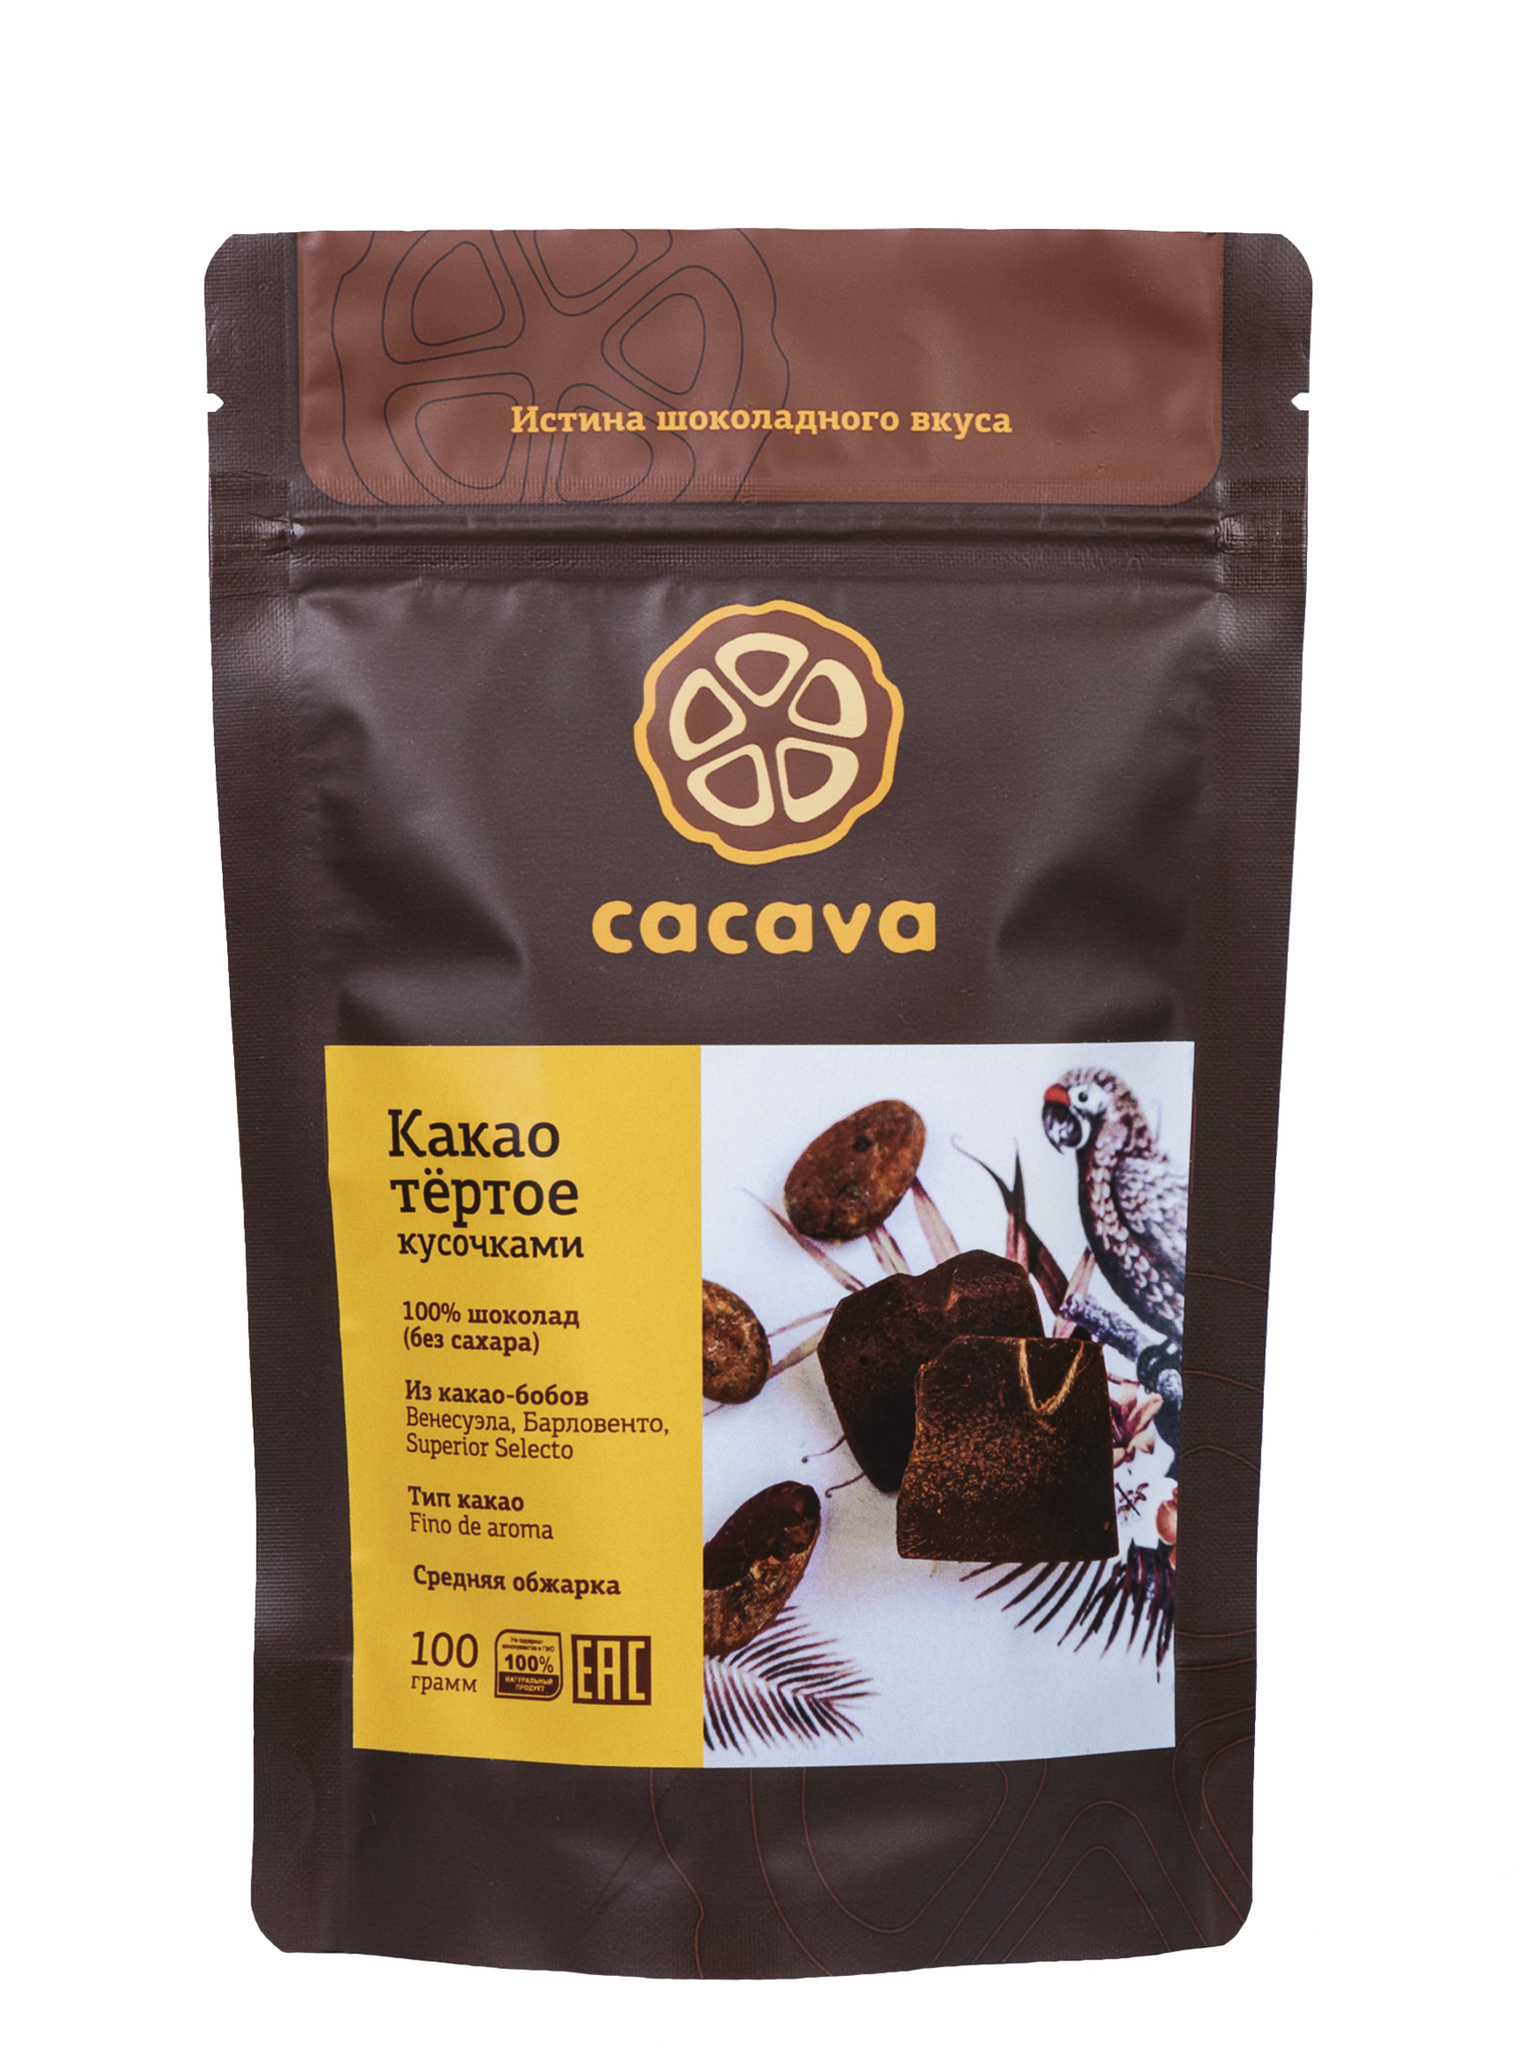 Какао тёртое кусочками (Венесуэла), упаковка 100 грамм